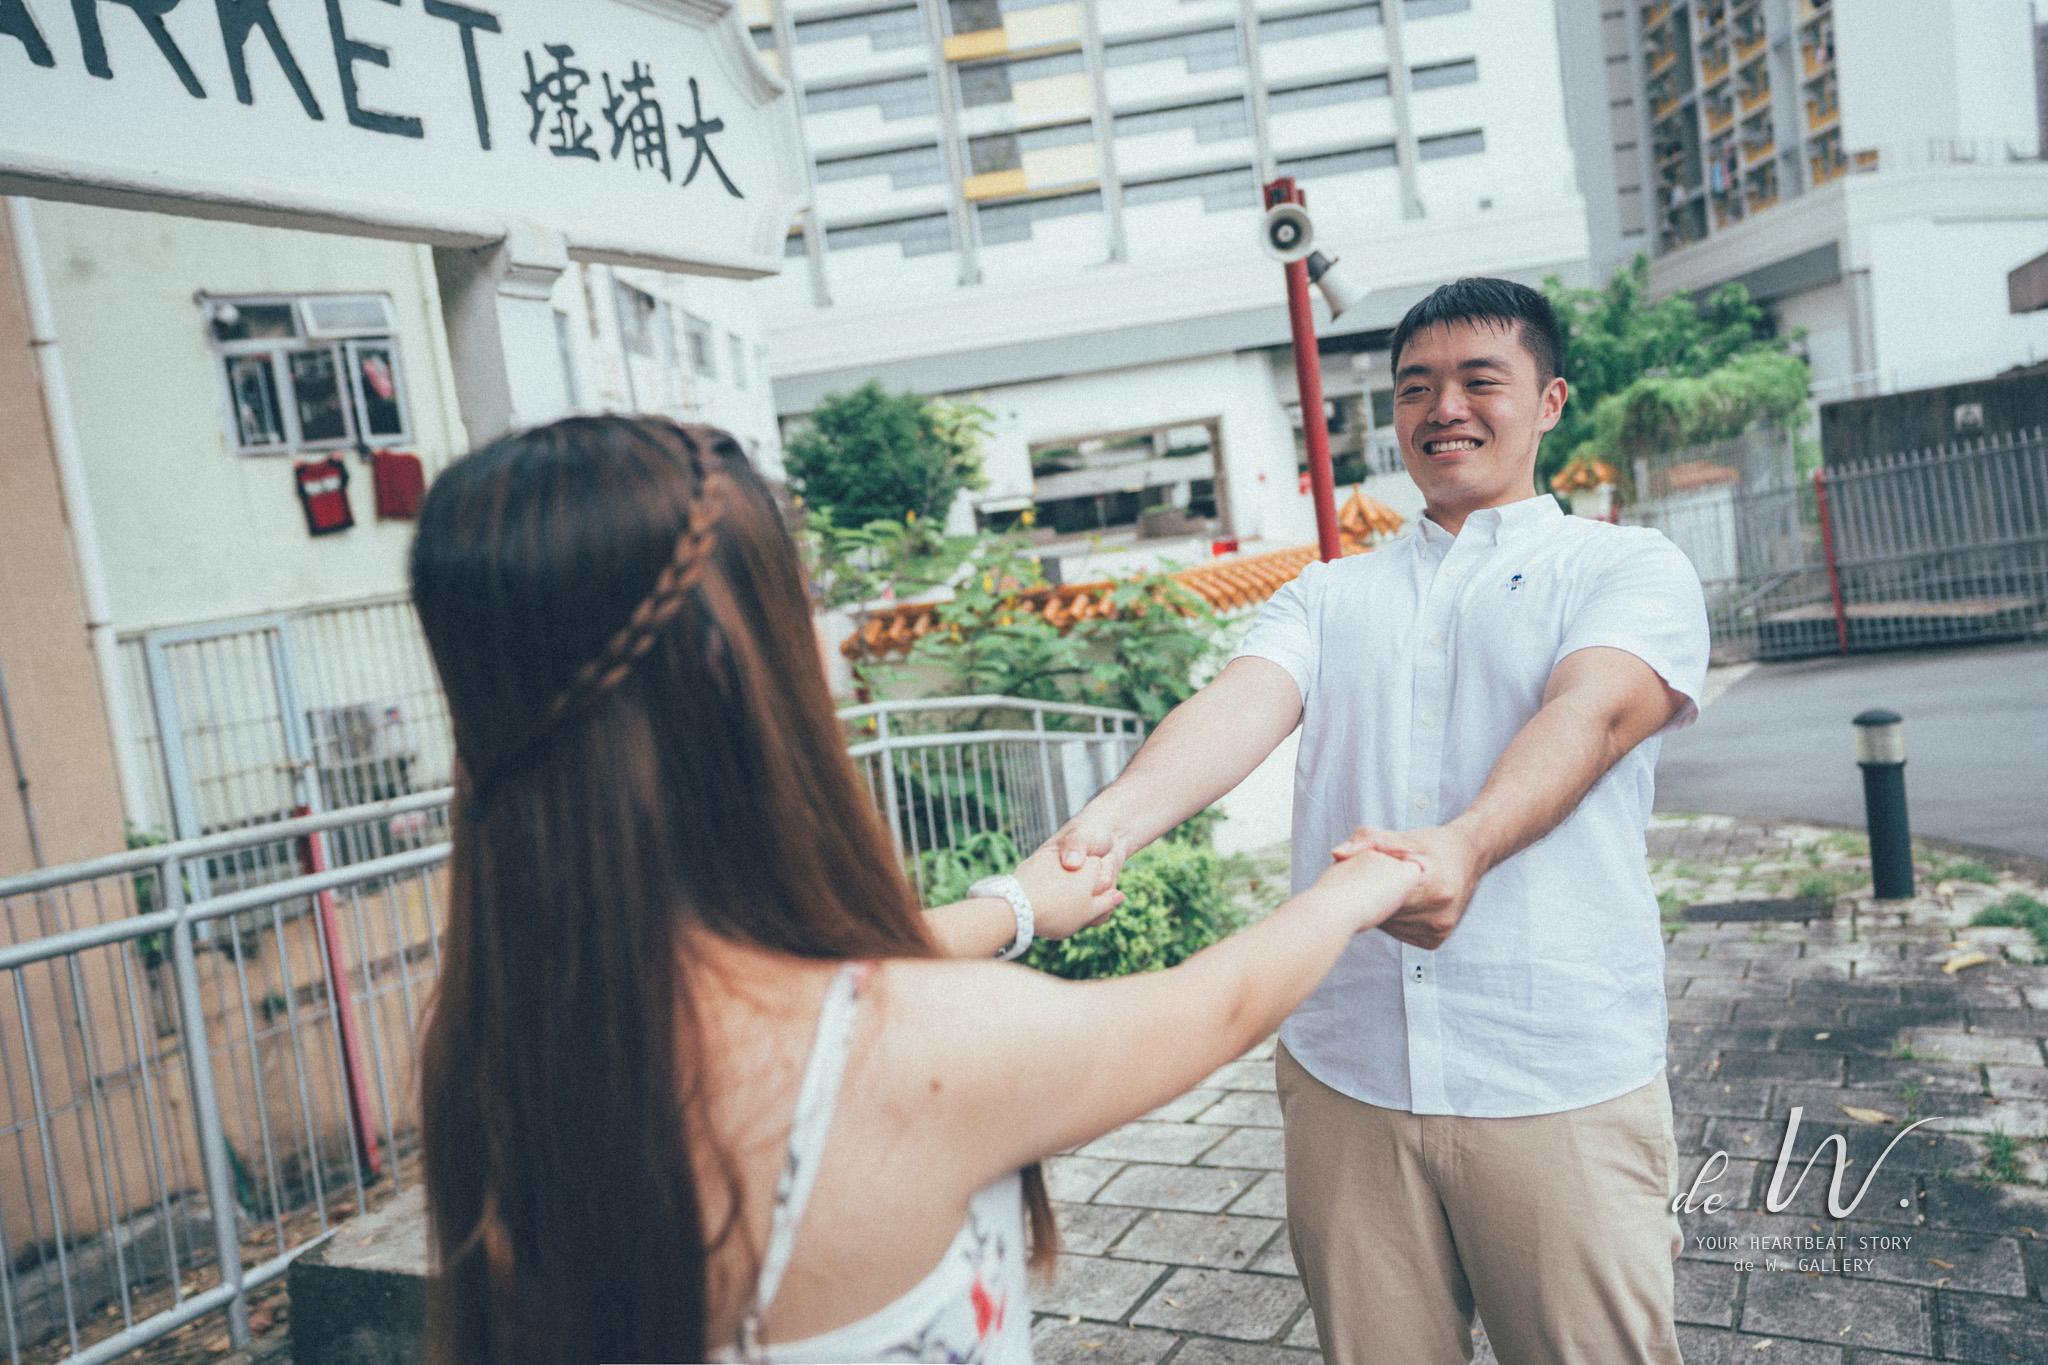 film style story teller de w gallery top10 destination wedding 大埔 火車 2048-025